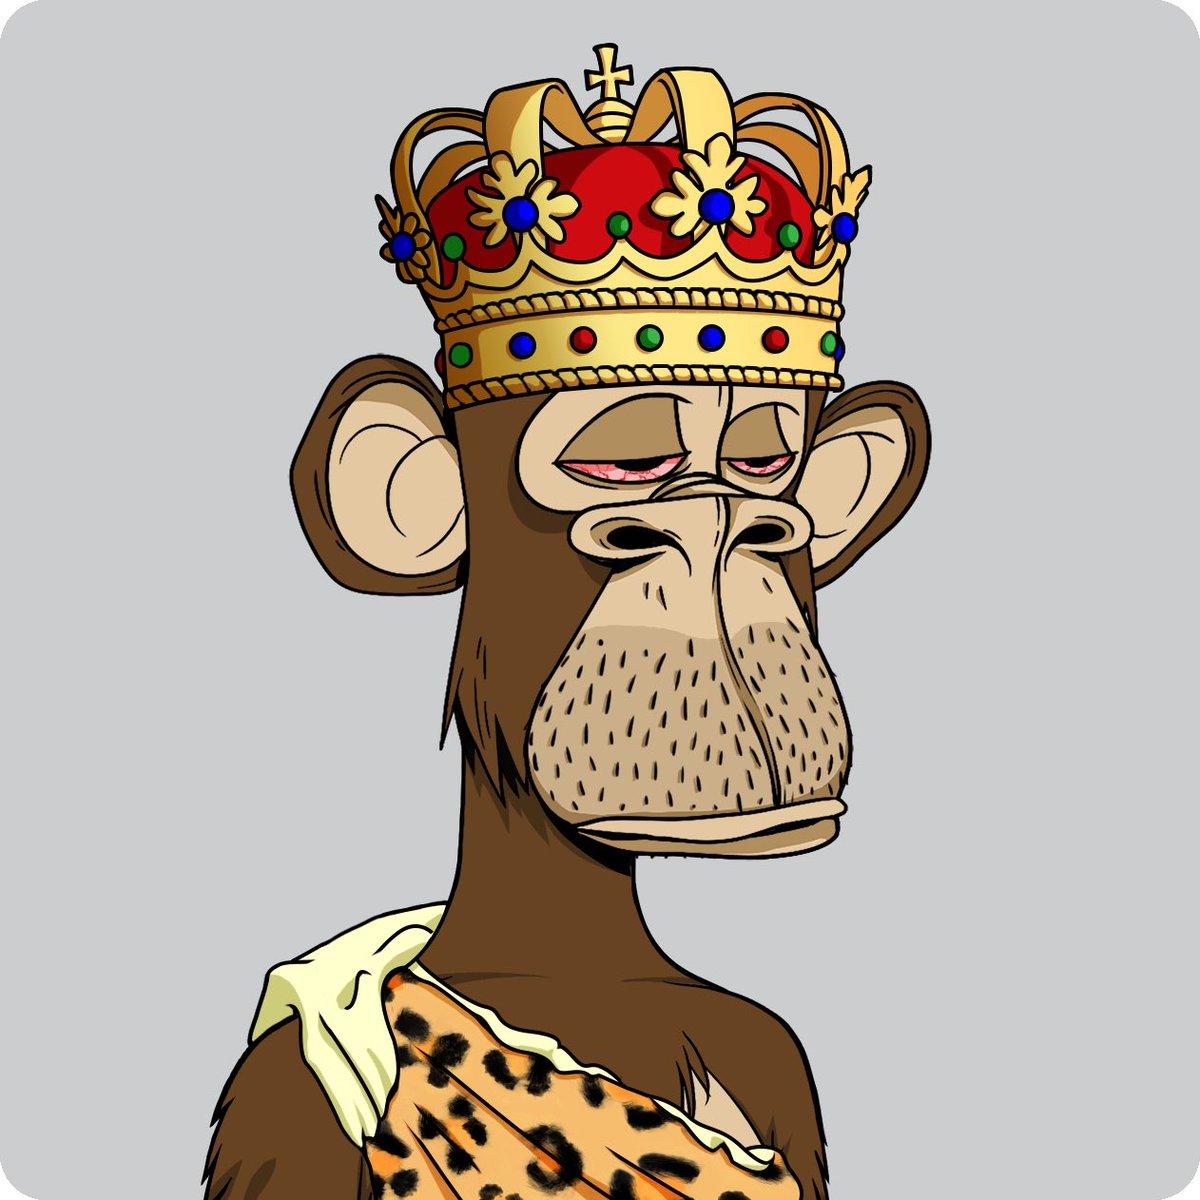 Please welcome the Caveman King to the family @BoredApeYC @boredapebot #ApeKing #CavemanKing